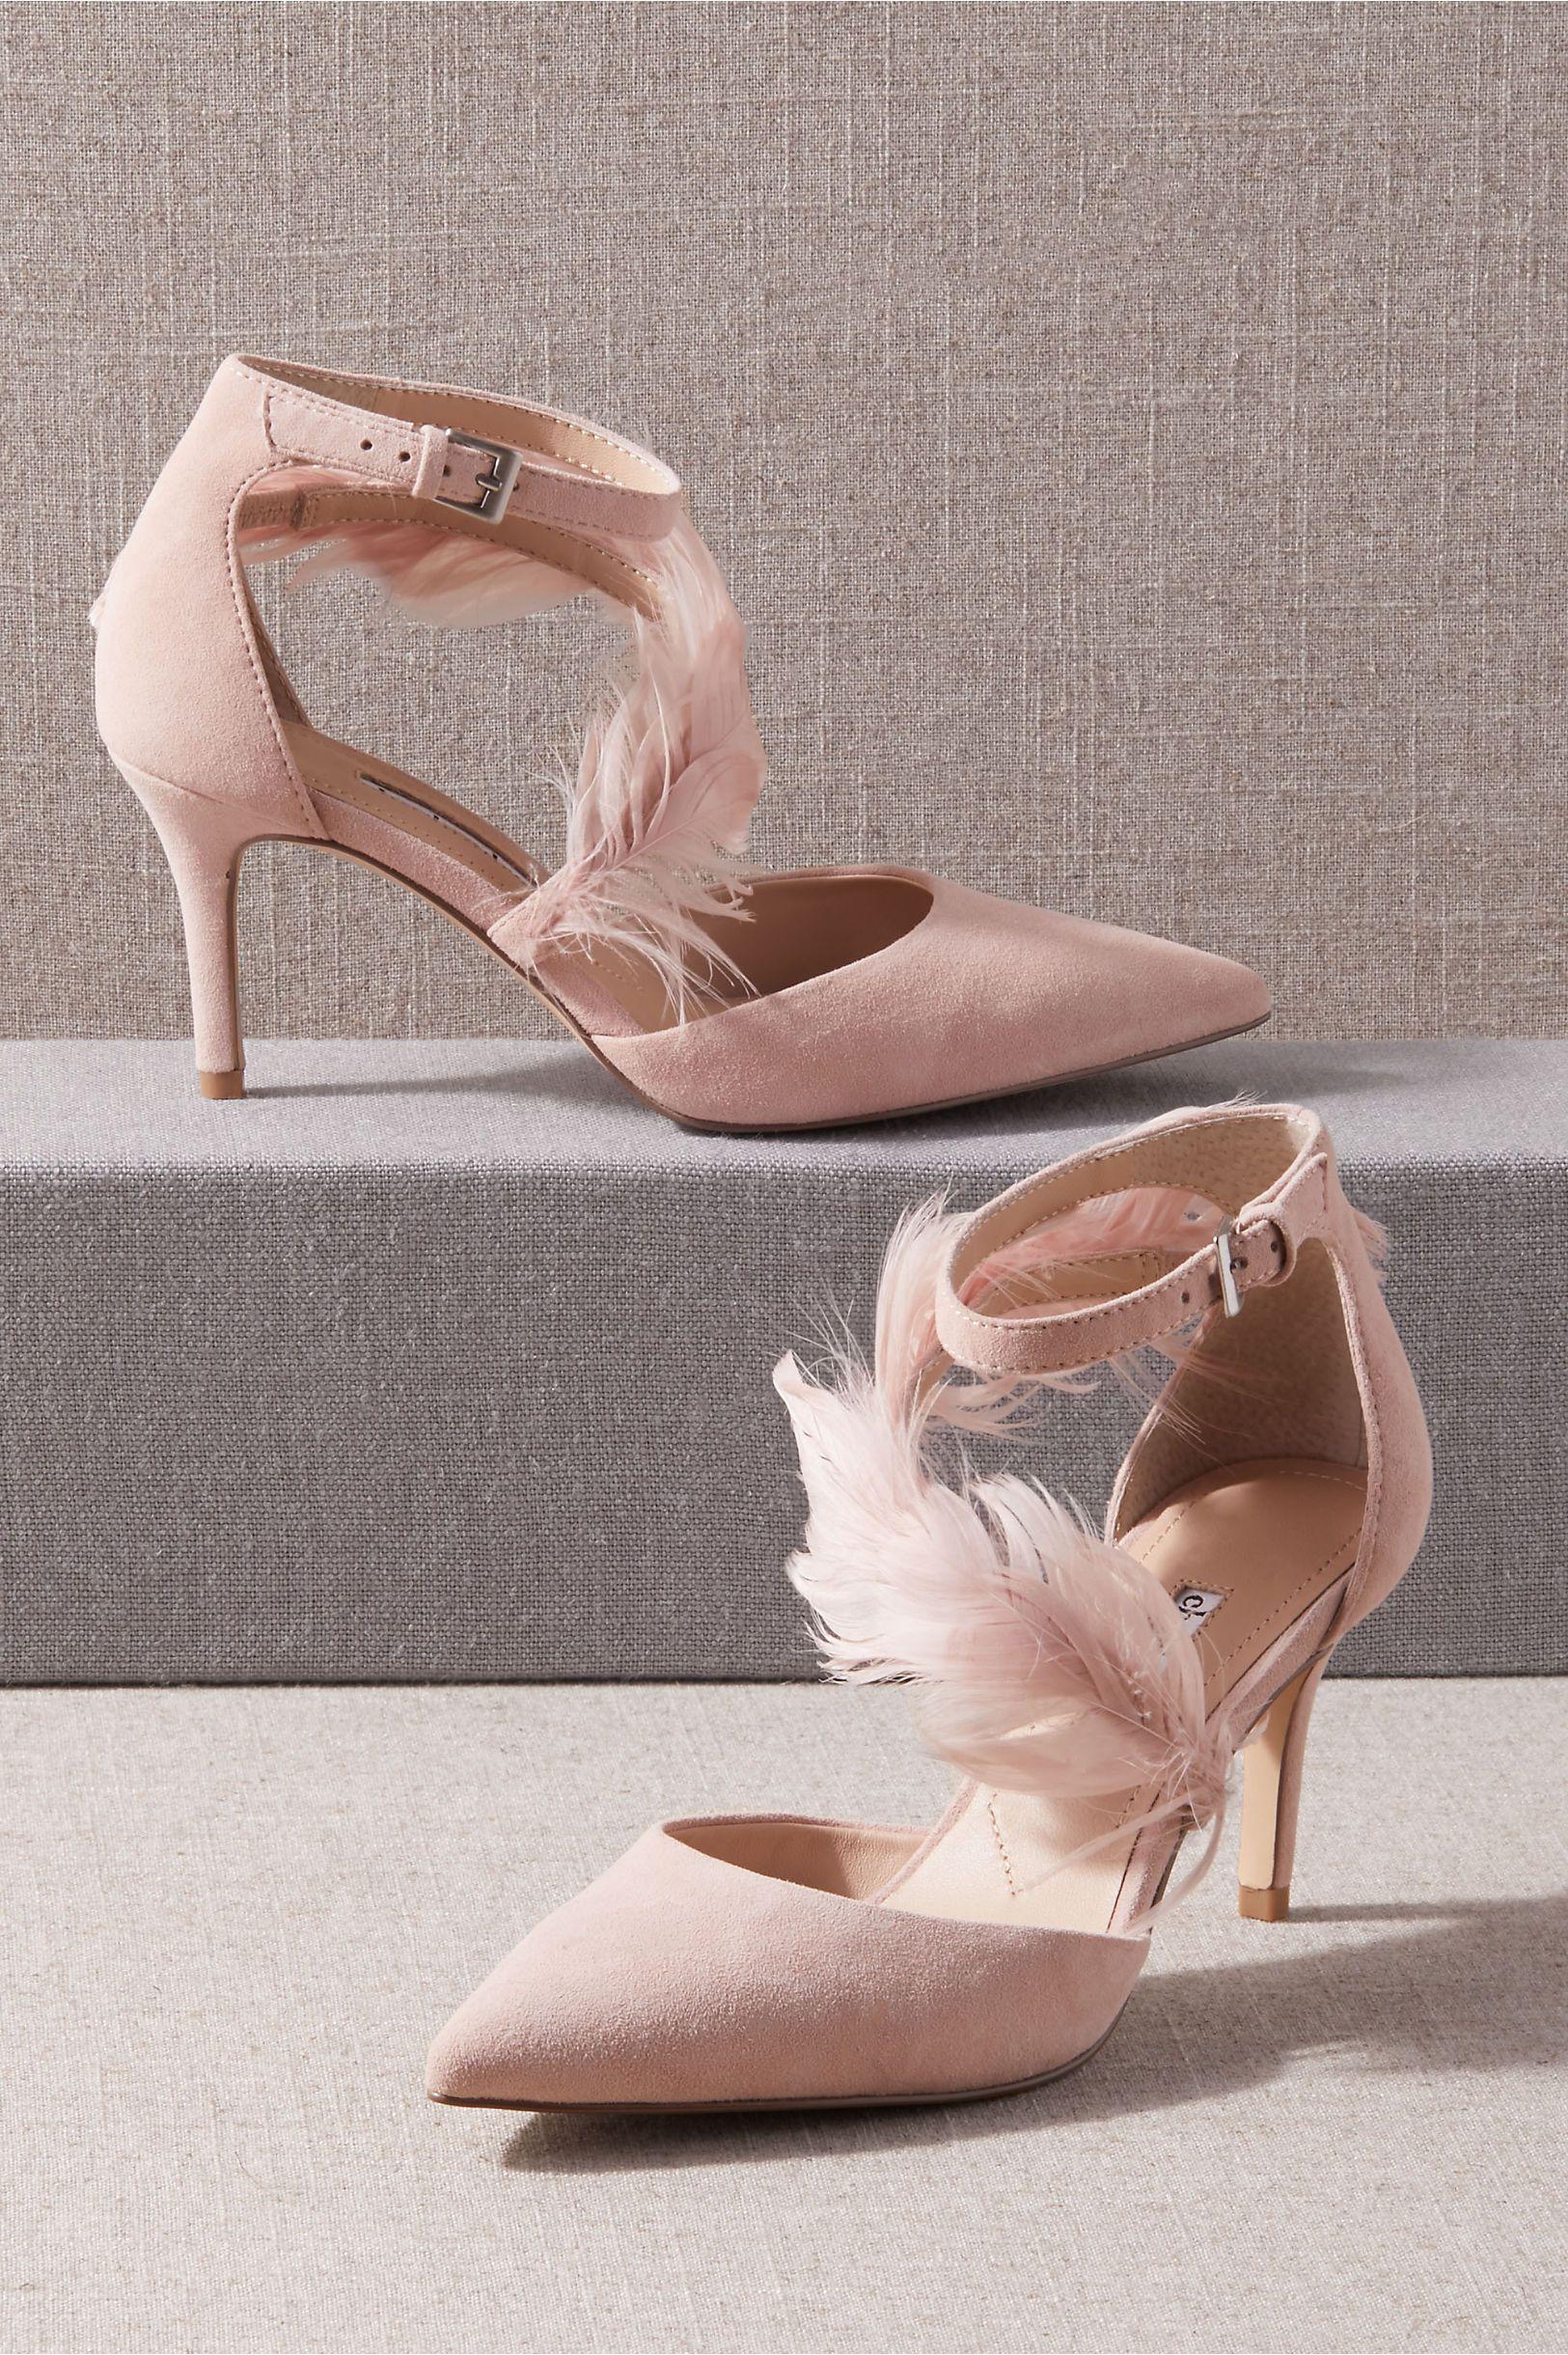 Charles David Duvette Heels In Pink Size 7 5 At Bhldn Heels